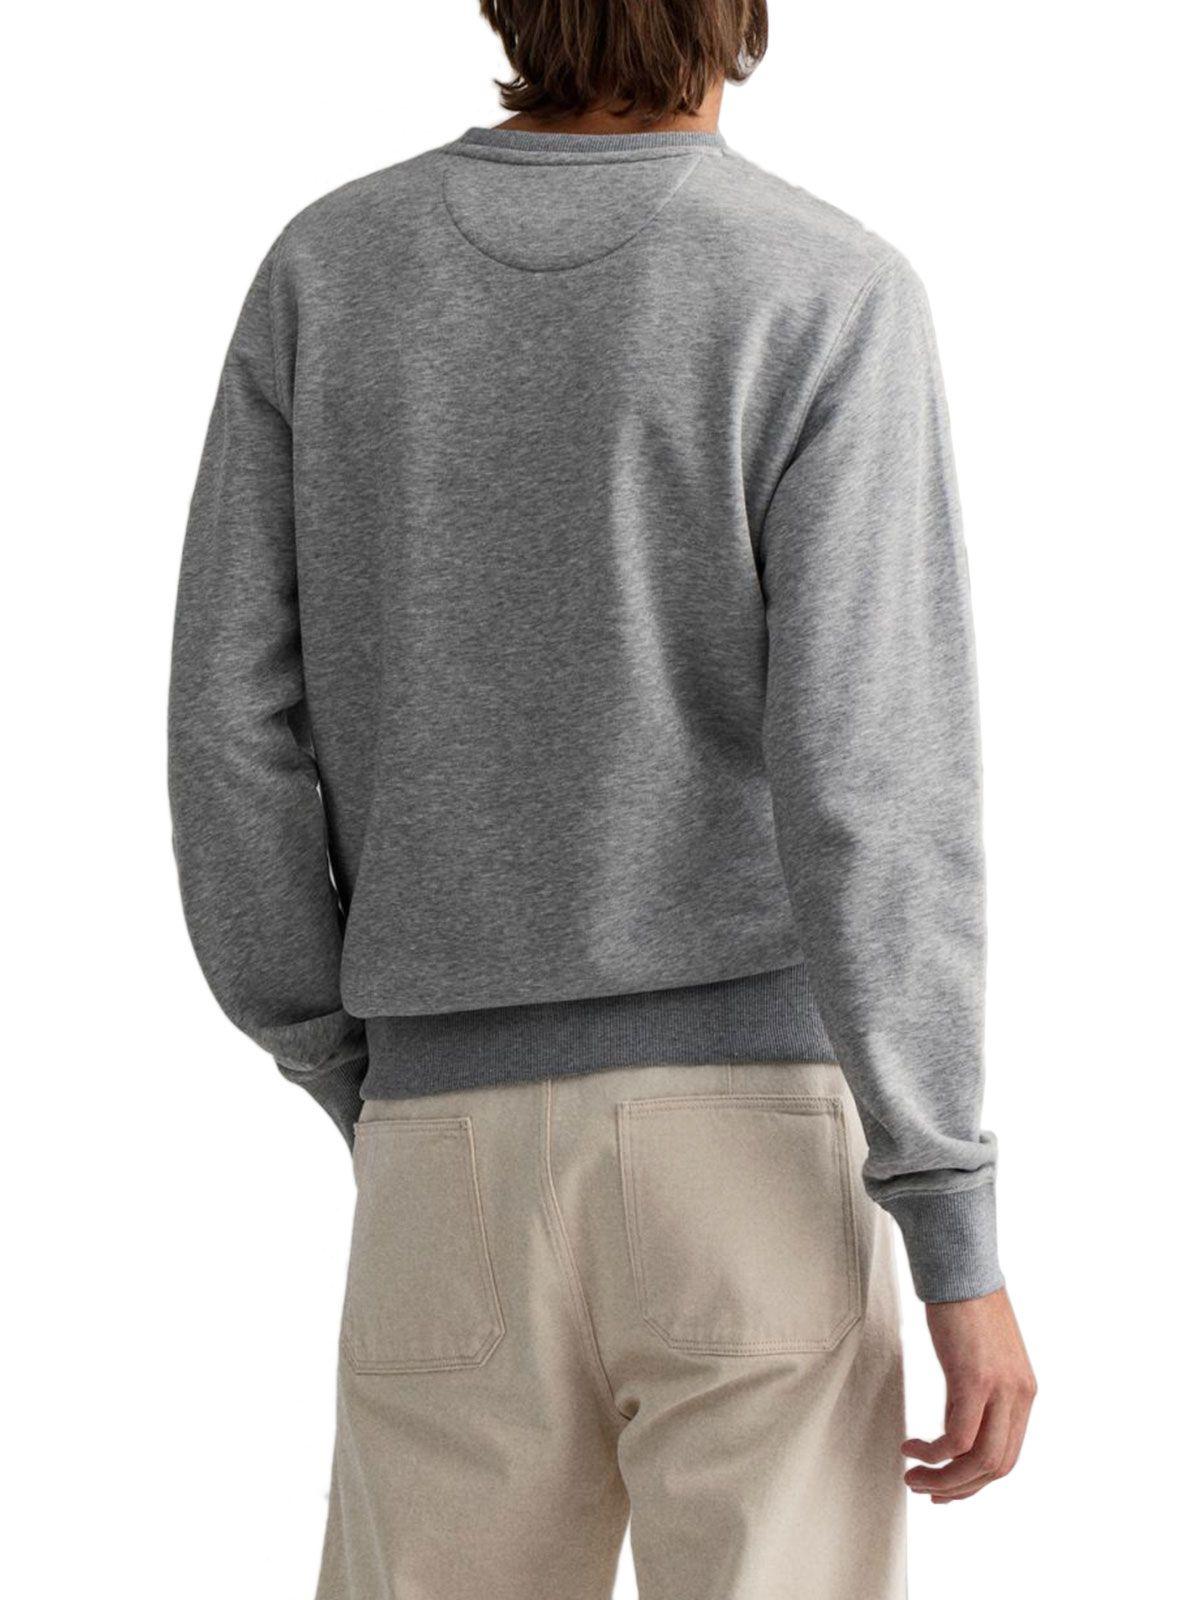 GANT Sweatshirts GANT MEN'S GREY COTTON SWEATSHIRT